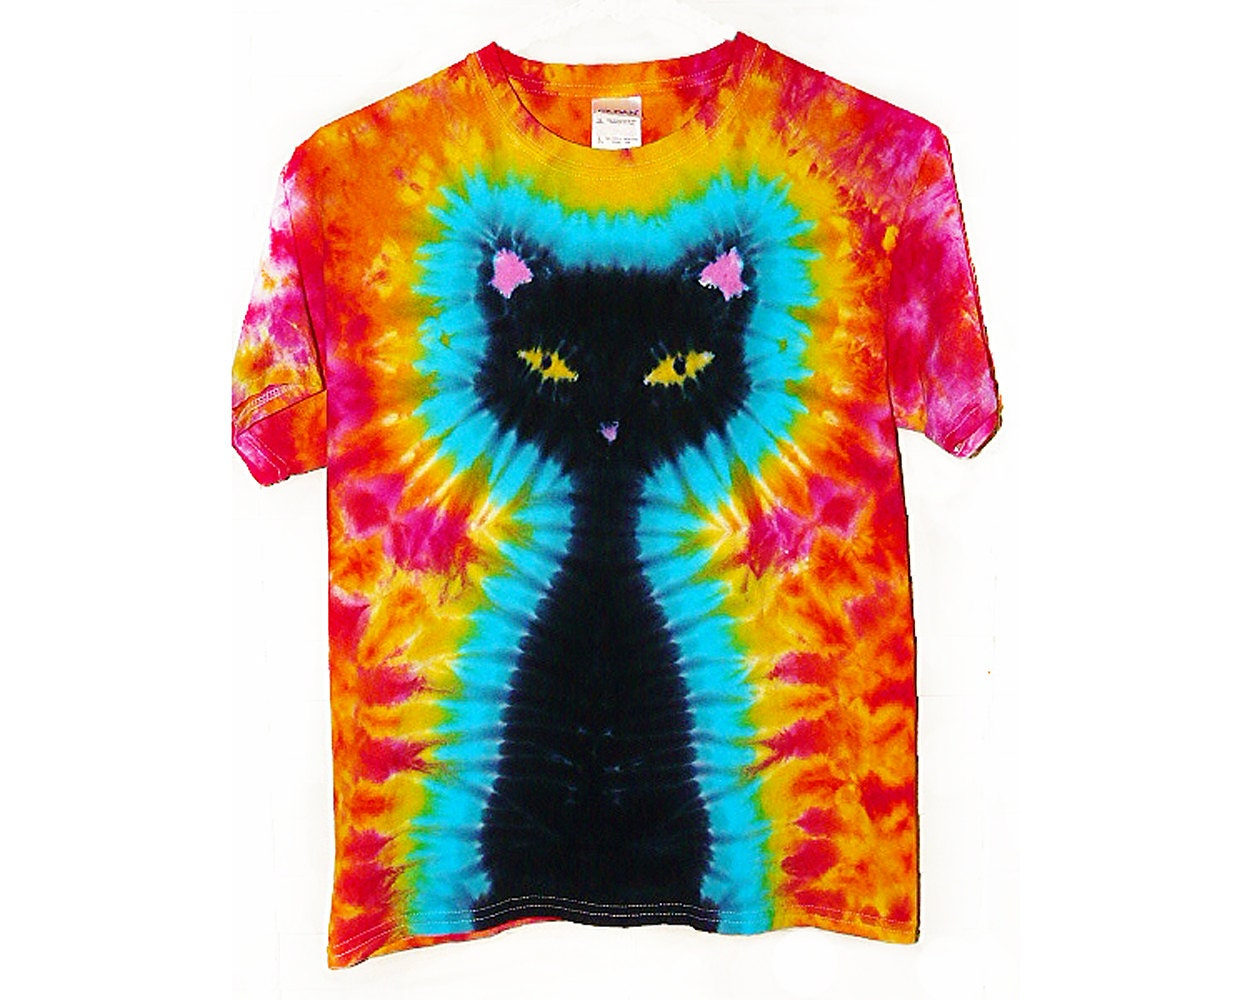 tie dye shirt black cat tie dye design eco friendly